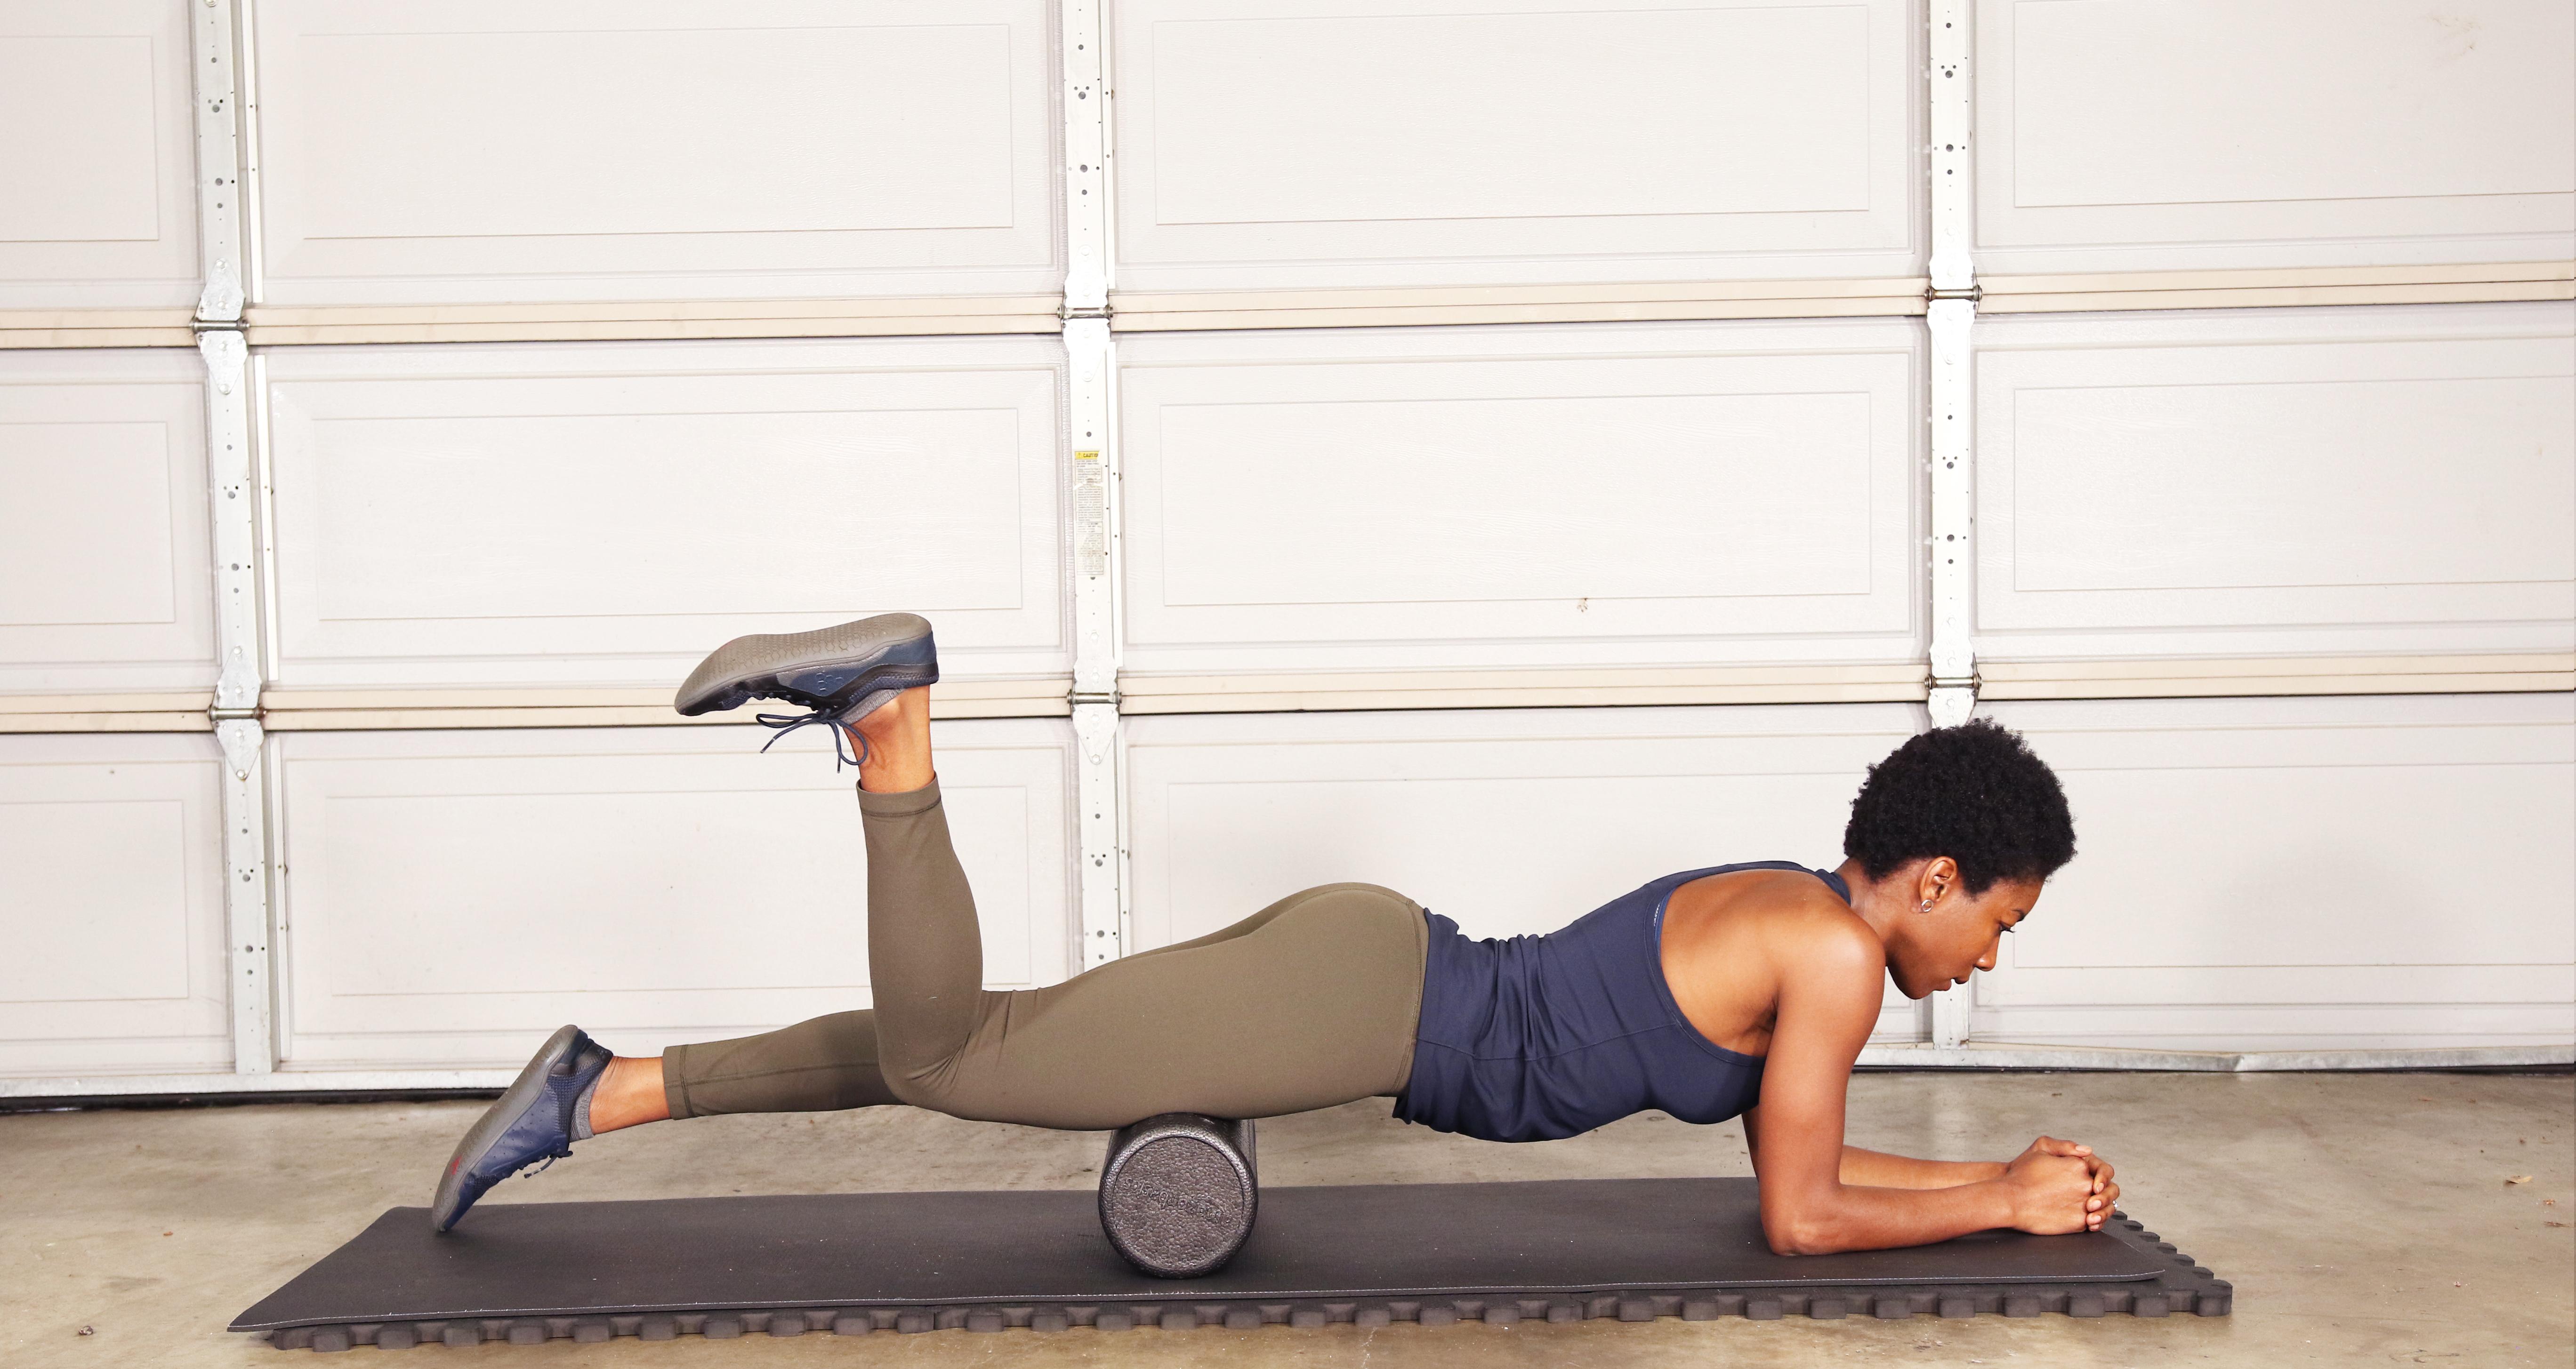 Hip Flexor Stretches for Back Pain